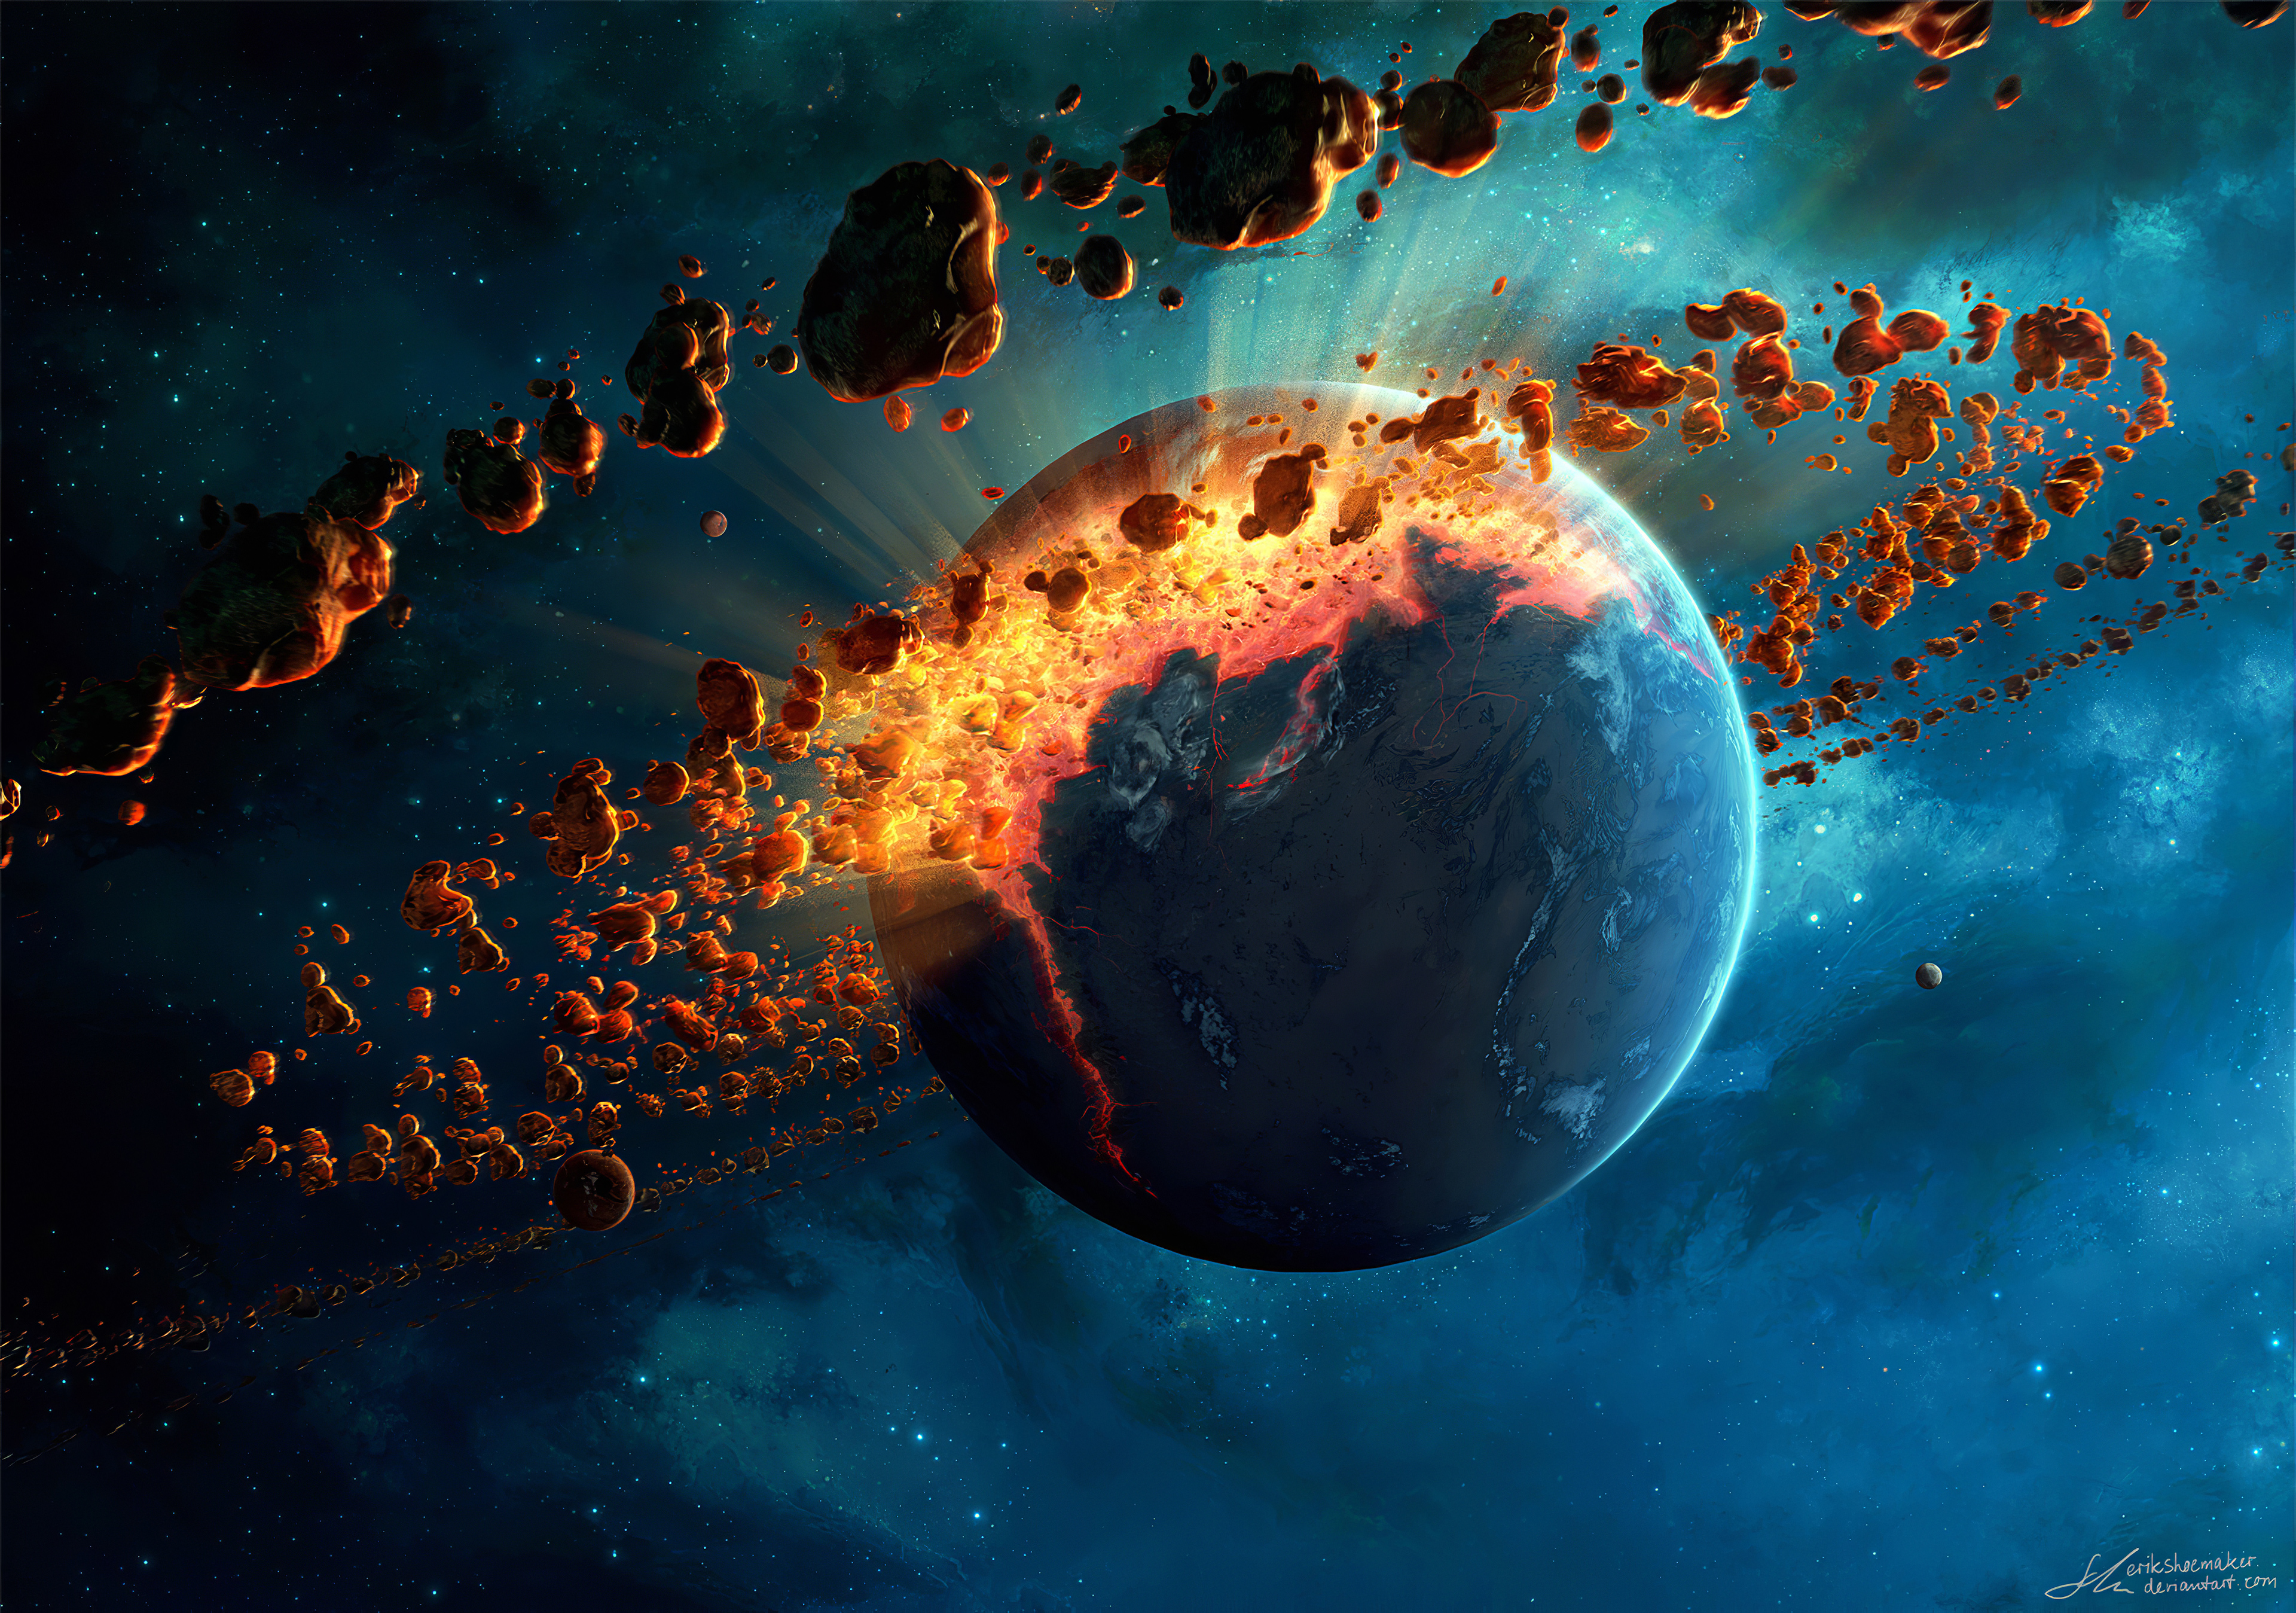 revolving around planet 1574943229 - Revolving Around Planet -